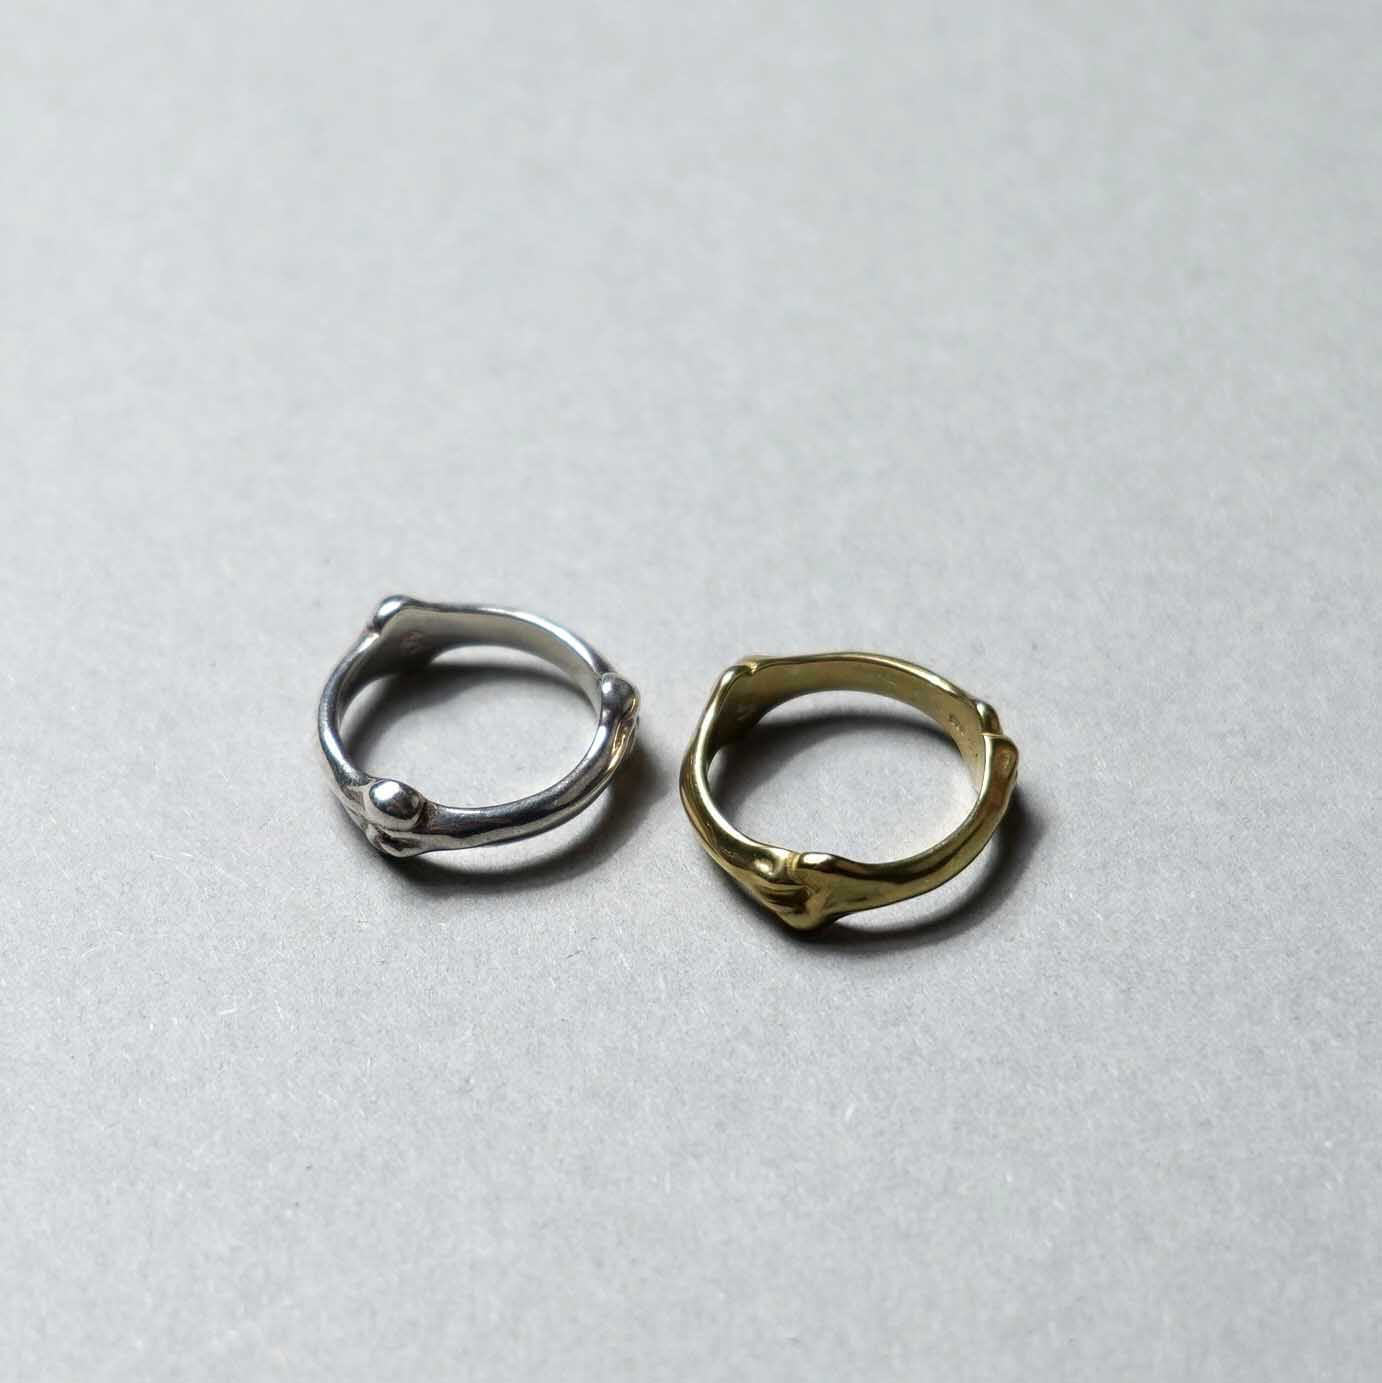 The Soloist / sa.0027SS21 bone shaped band ring.